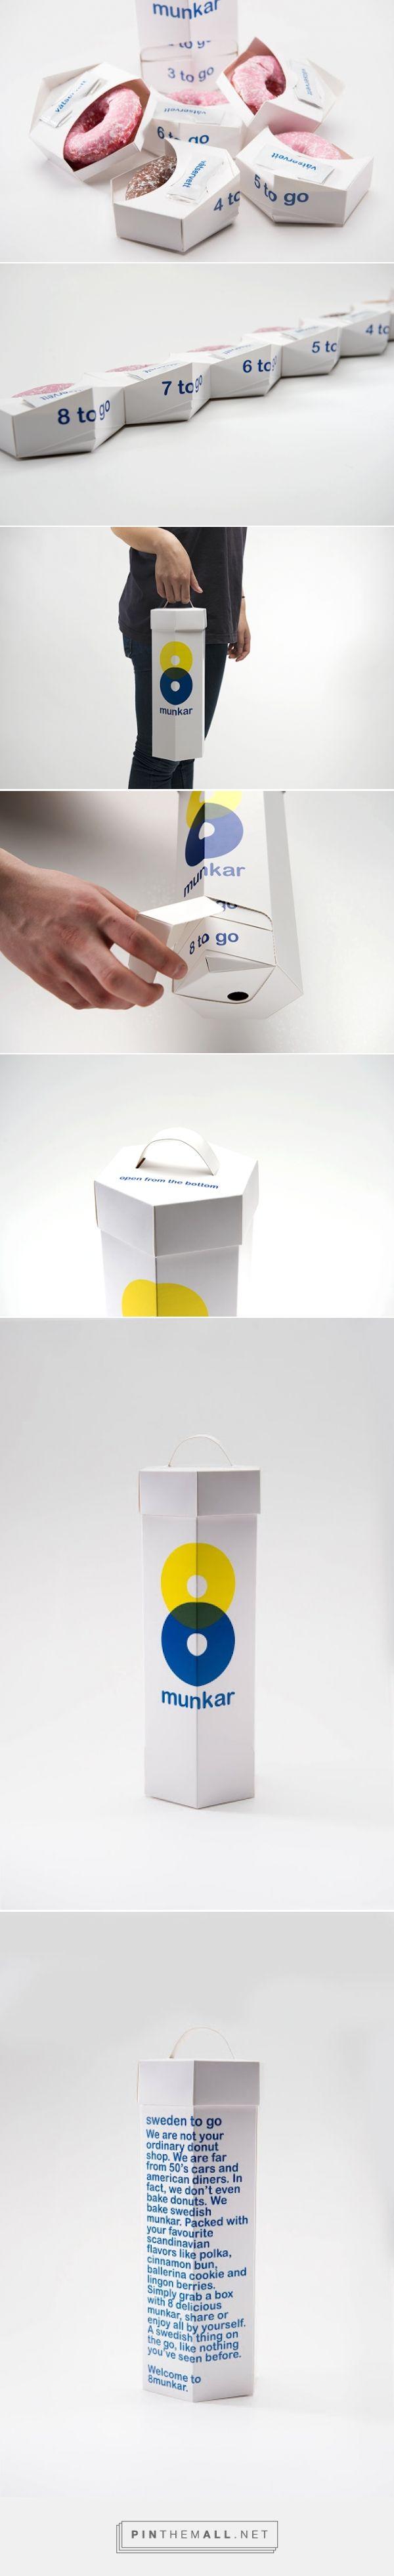 8munkar | Student Packaging Concept | Designers: Emelie Johannesson & Oliver Sjöqvist